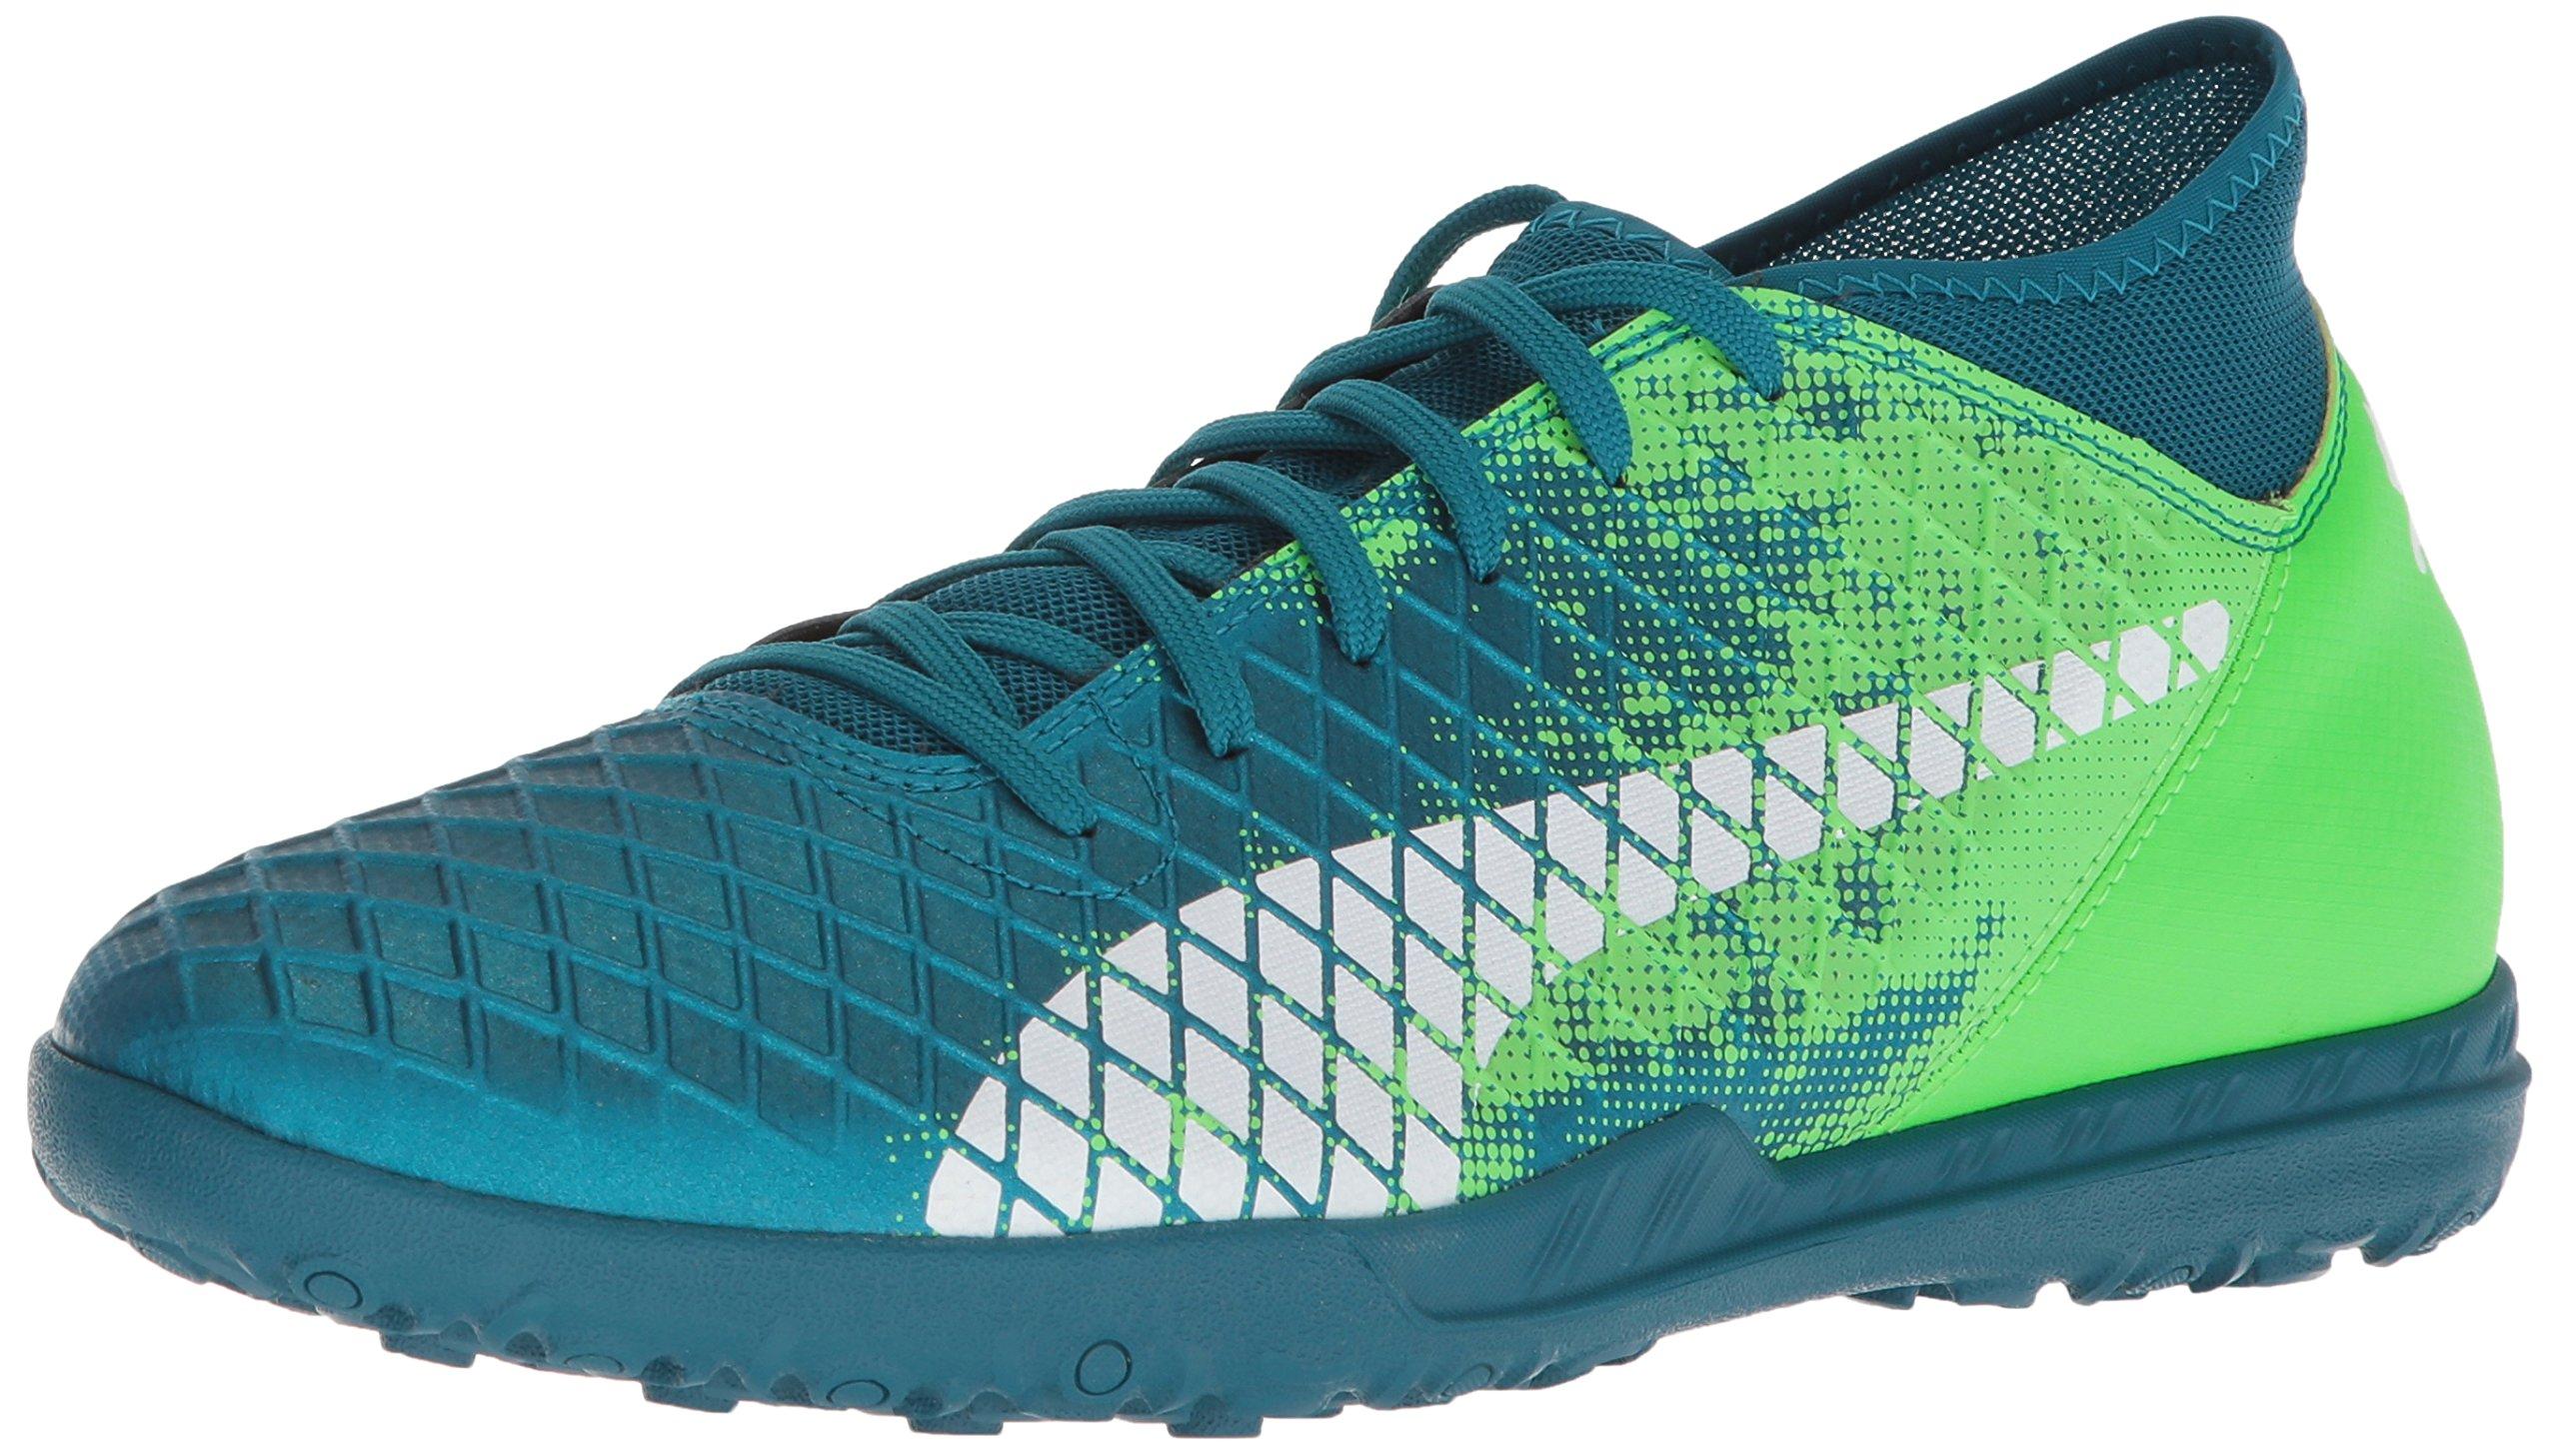 dc30b6552 Galleon - PUMA Men s Future 18.4 TT Soccer Shoe